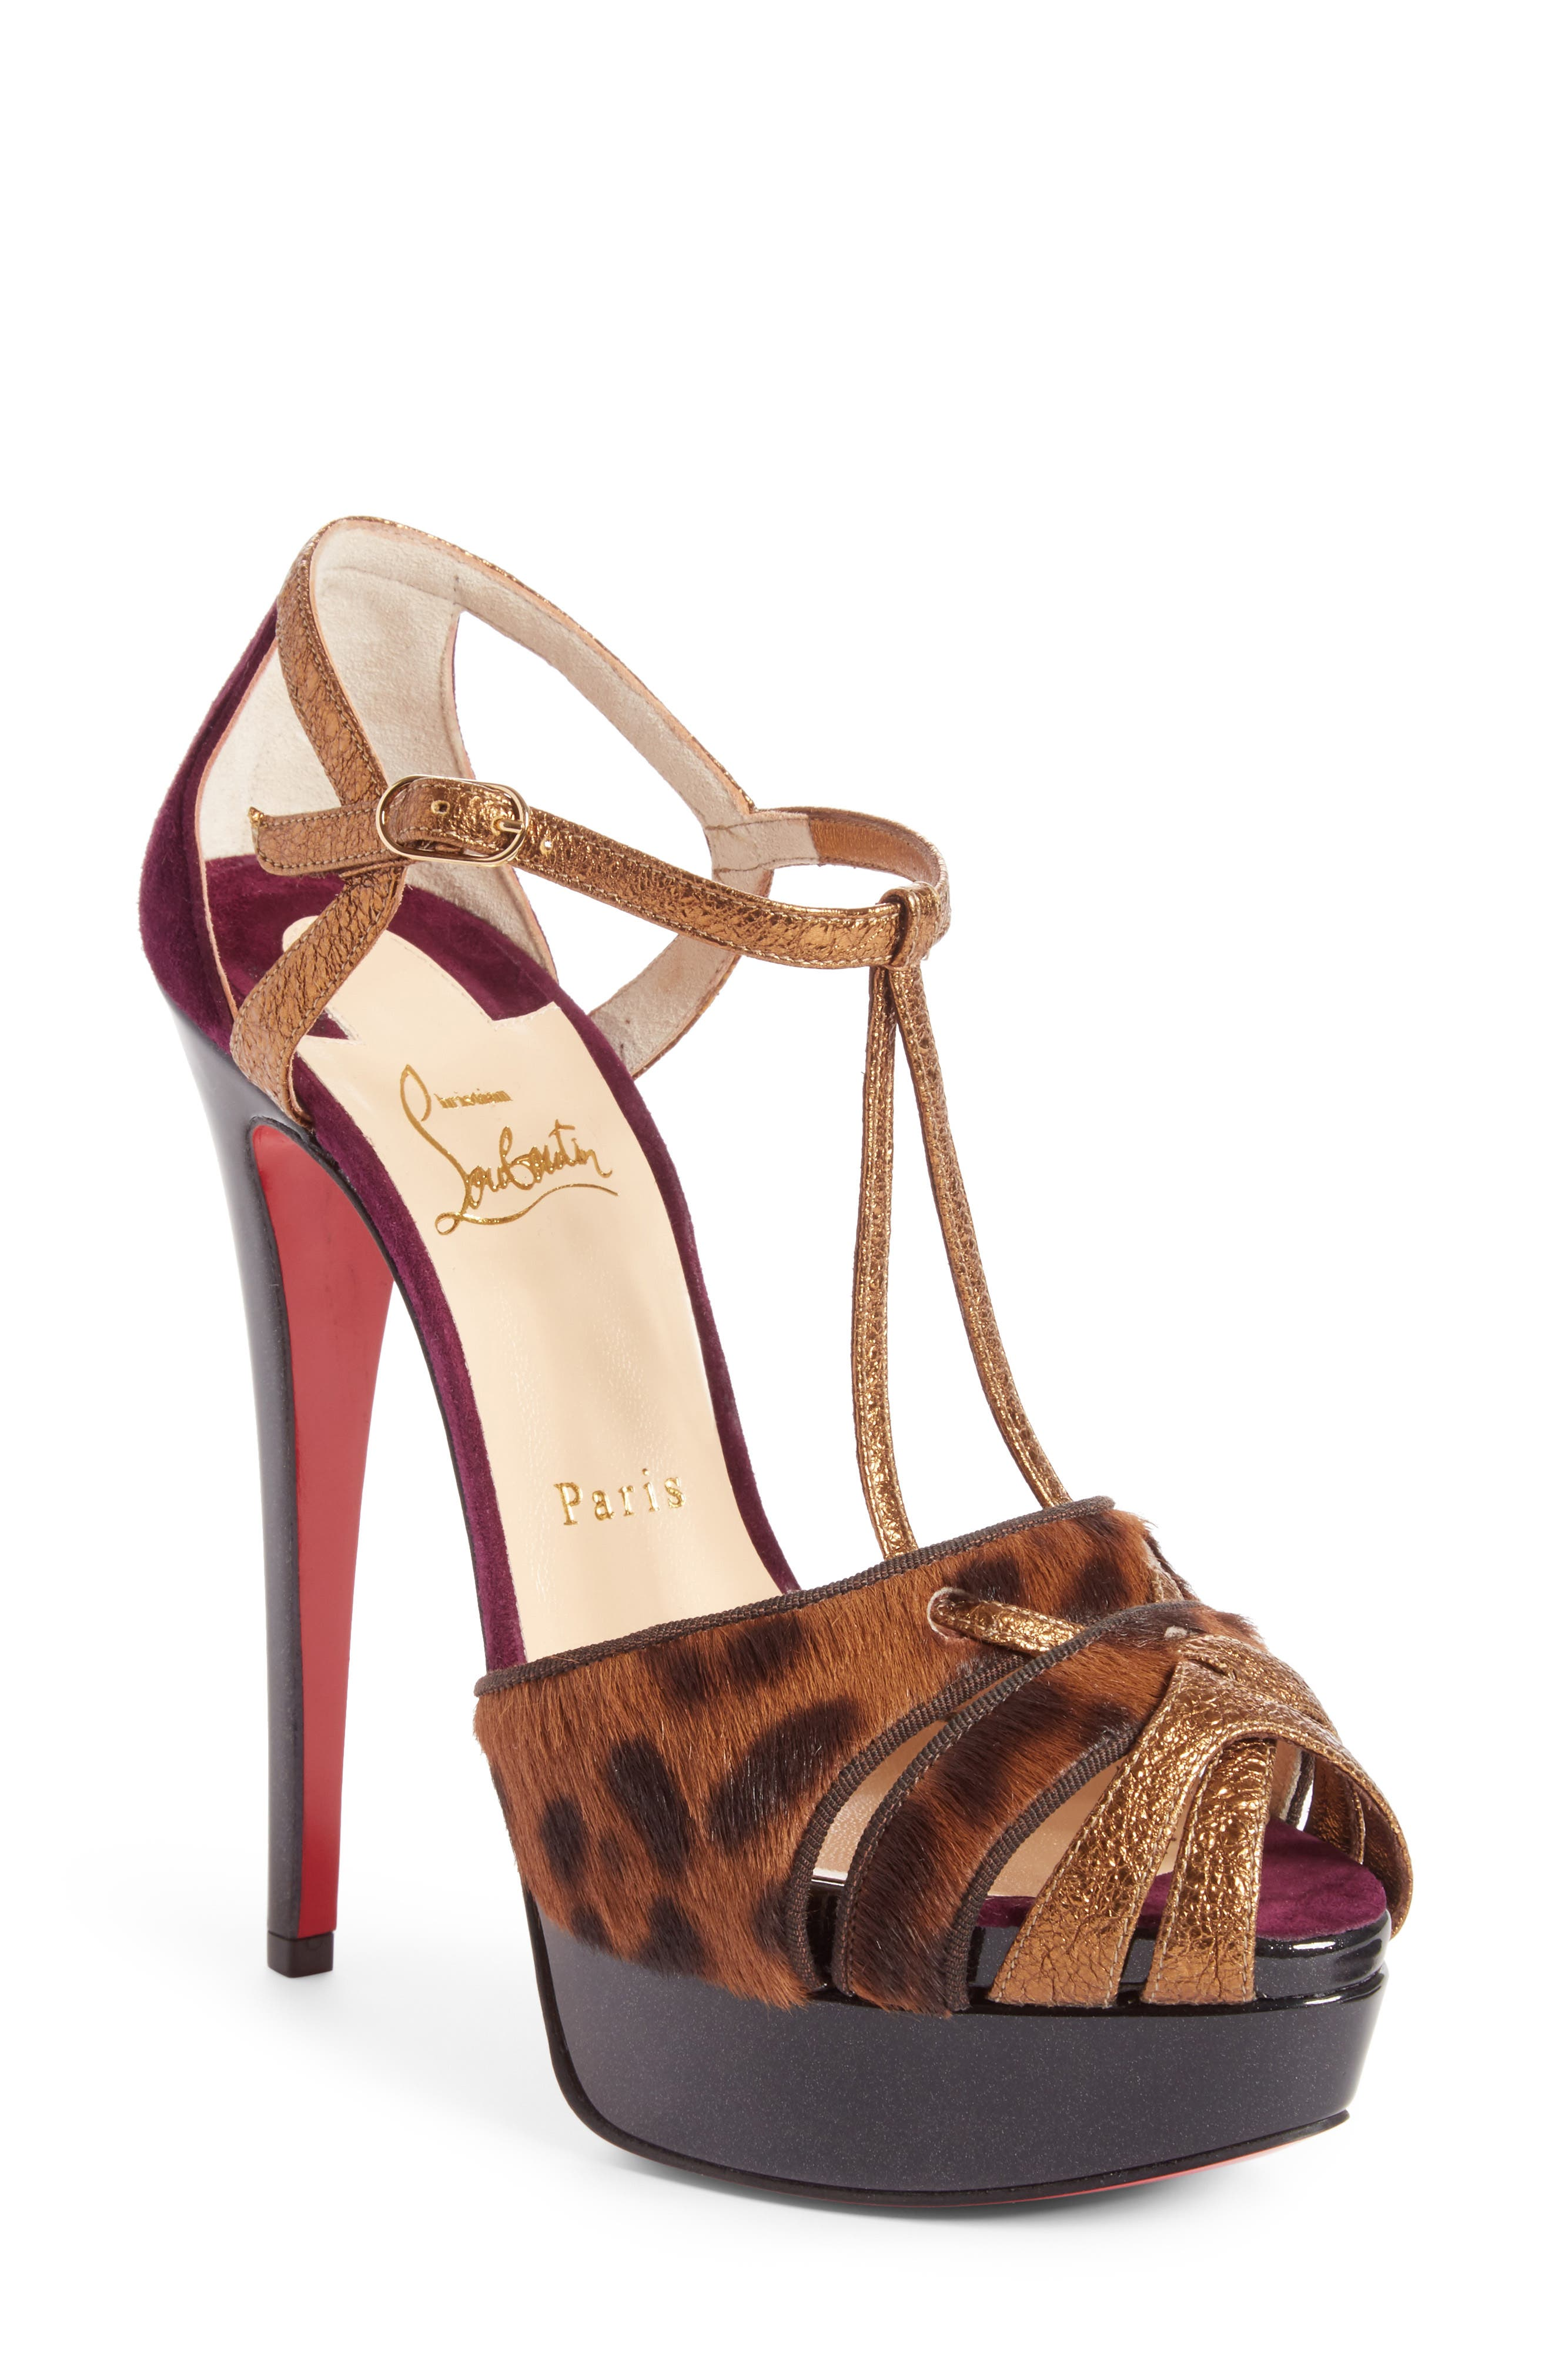 CHRISTIAN LOUBOUTIN Glennalta Genuine Calf Hair Platform Sandal